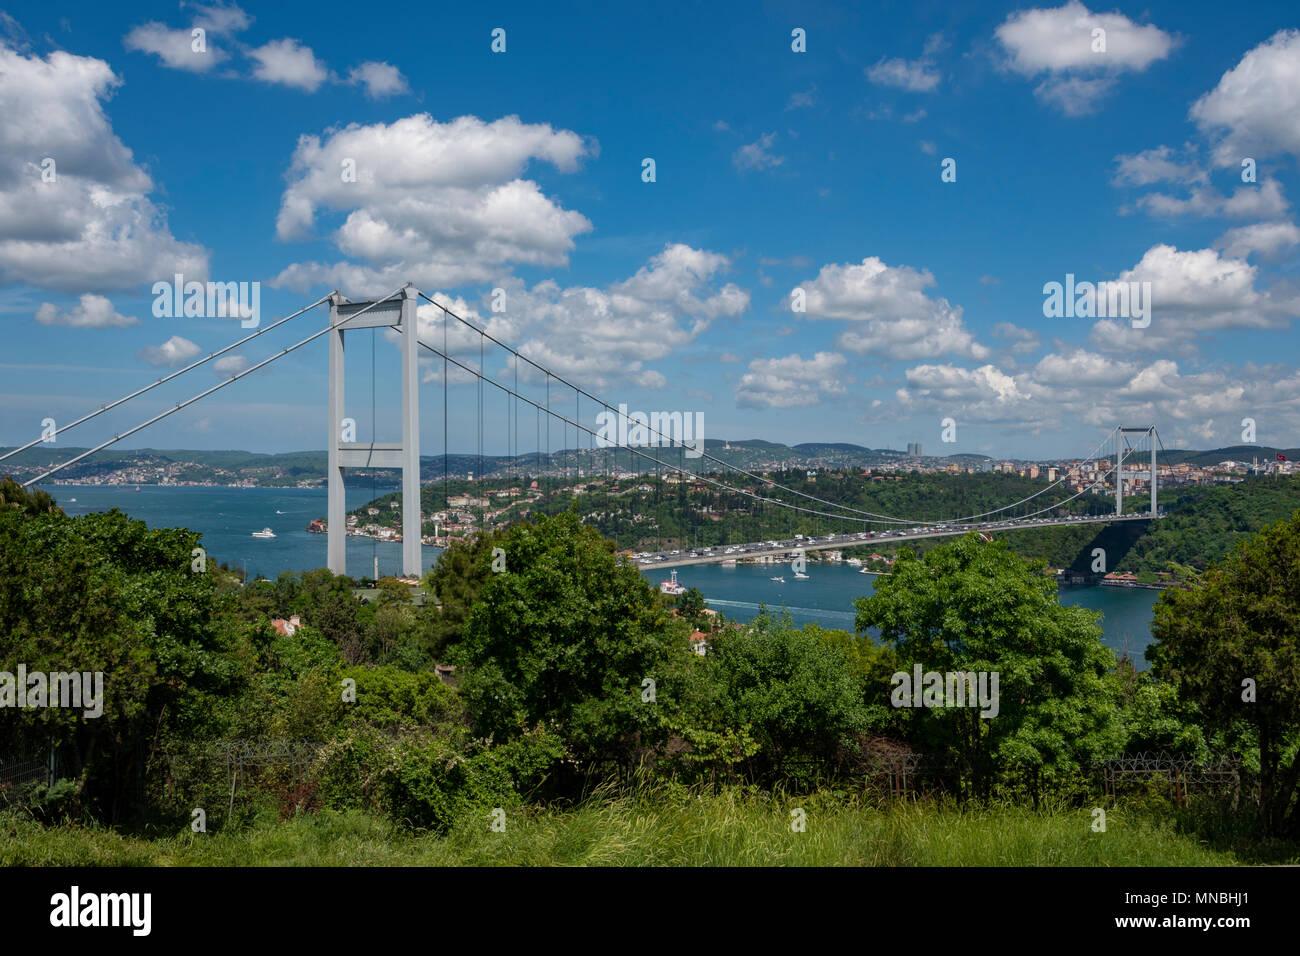 The Fatih Sultan Mehmet Bridge in the spring, Istanbul,Turkey Stock Photo